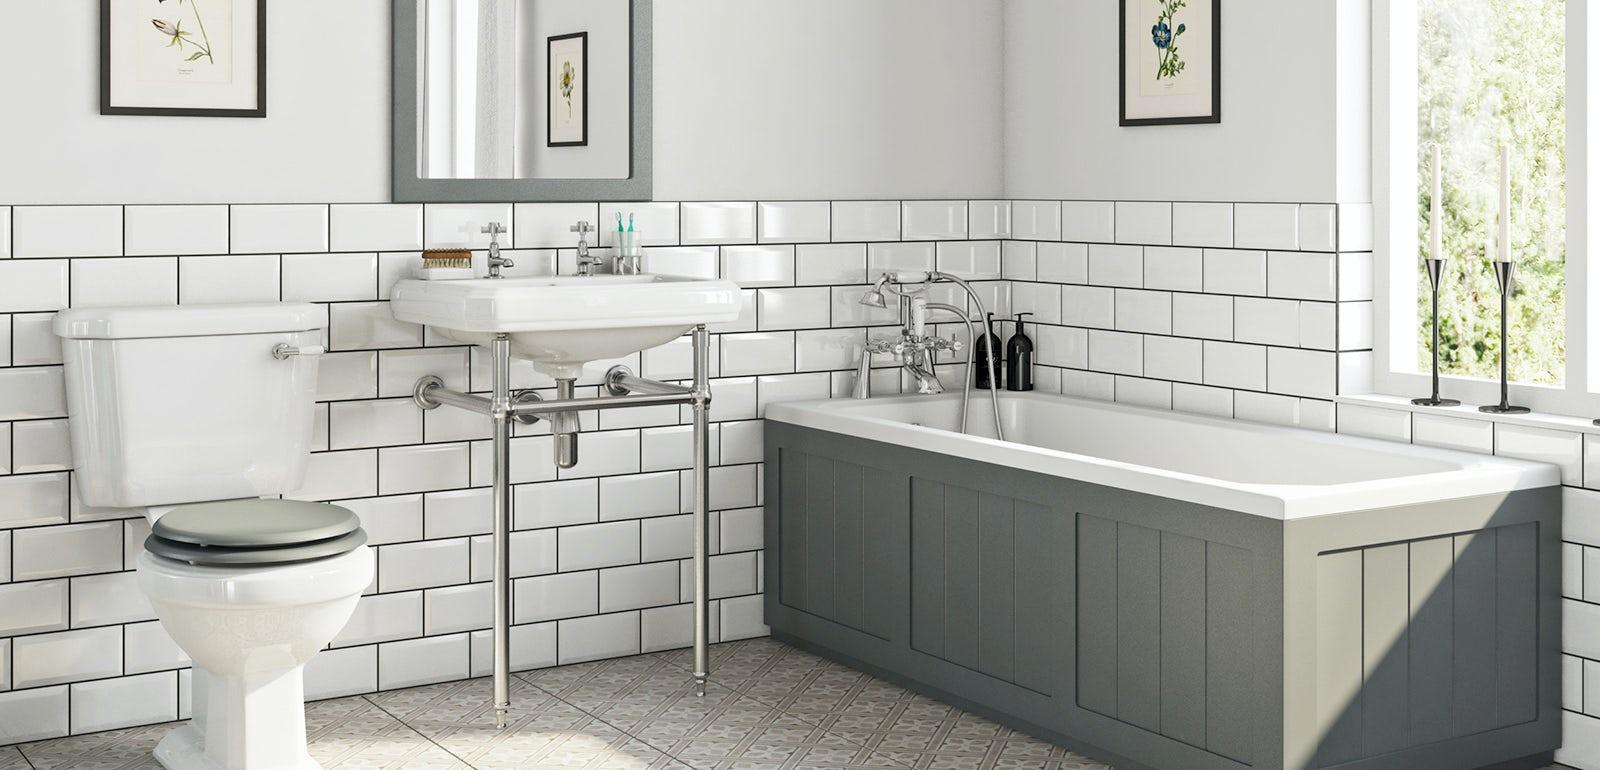 5 Gorgeous Scandinavian Bathroom Ideas: Beautiful Bathroom Suite Ideas 2019